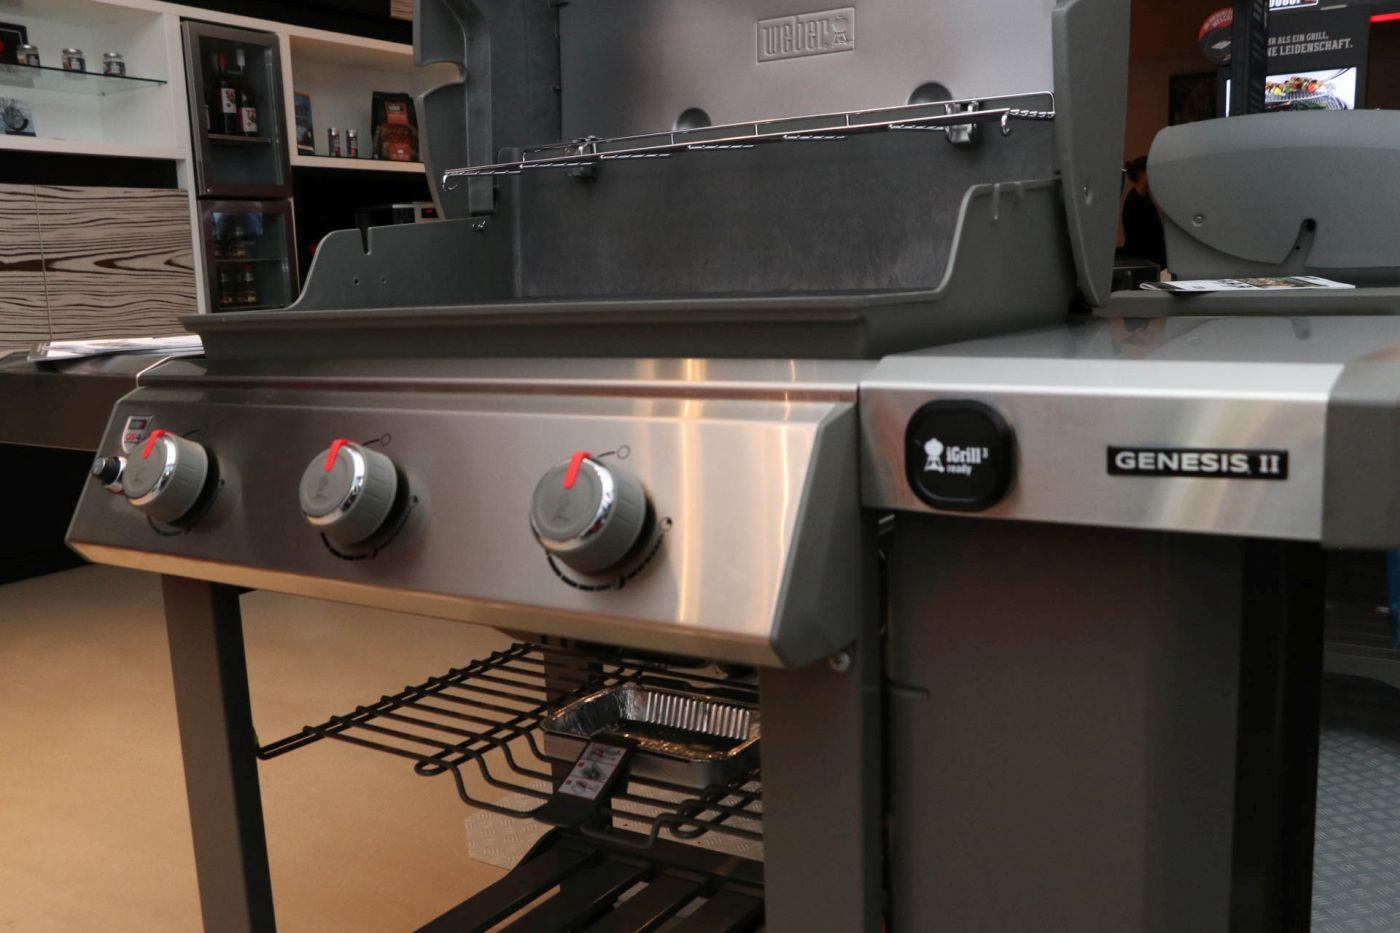 Weber Outdoor Küche Unterschrank : Weber neuheiten 2017 event bbqlicate grill & bbq blog